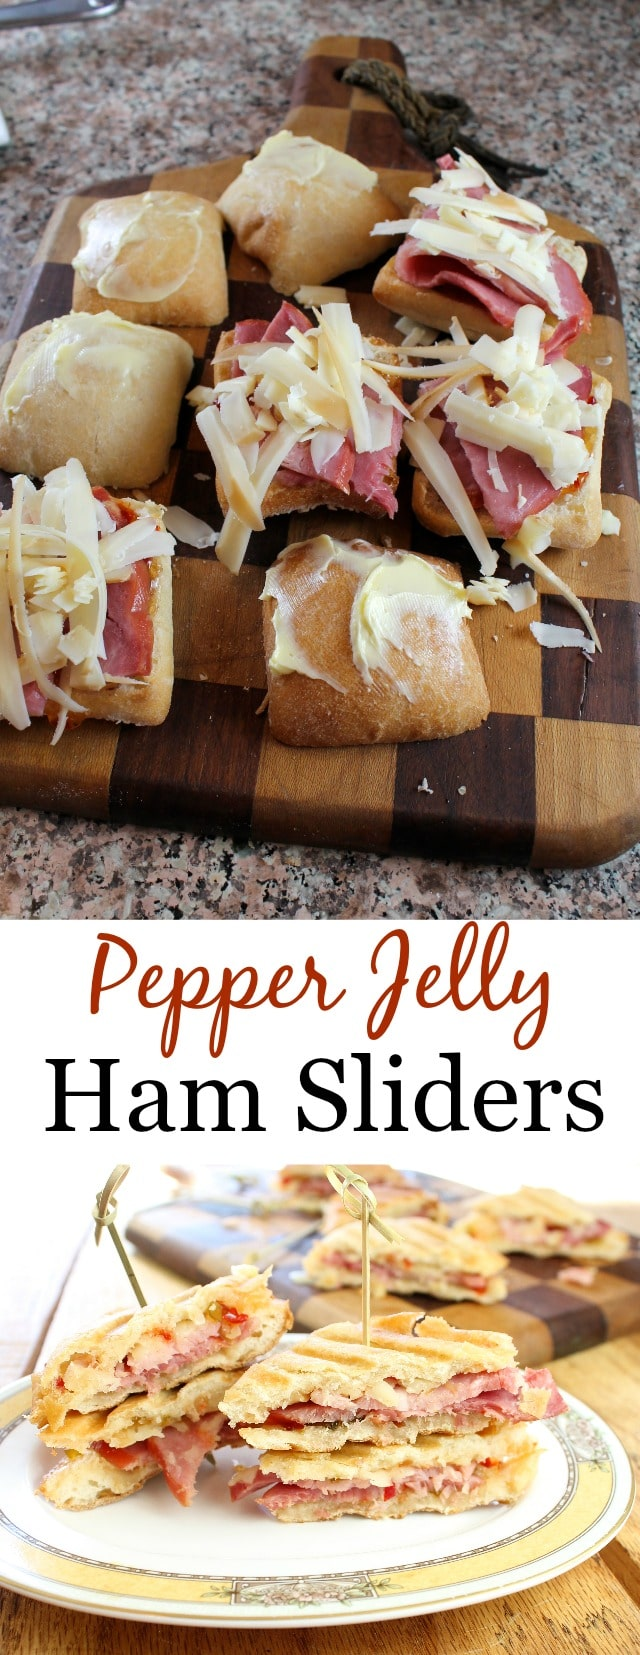 Pepper Jelly Ham Sliders get the recipe at missinthekitchen.com